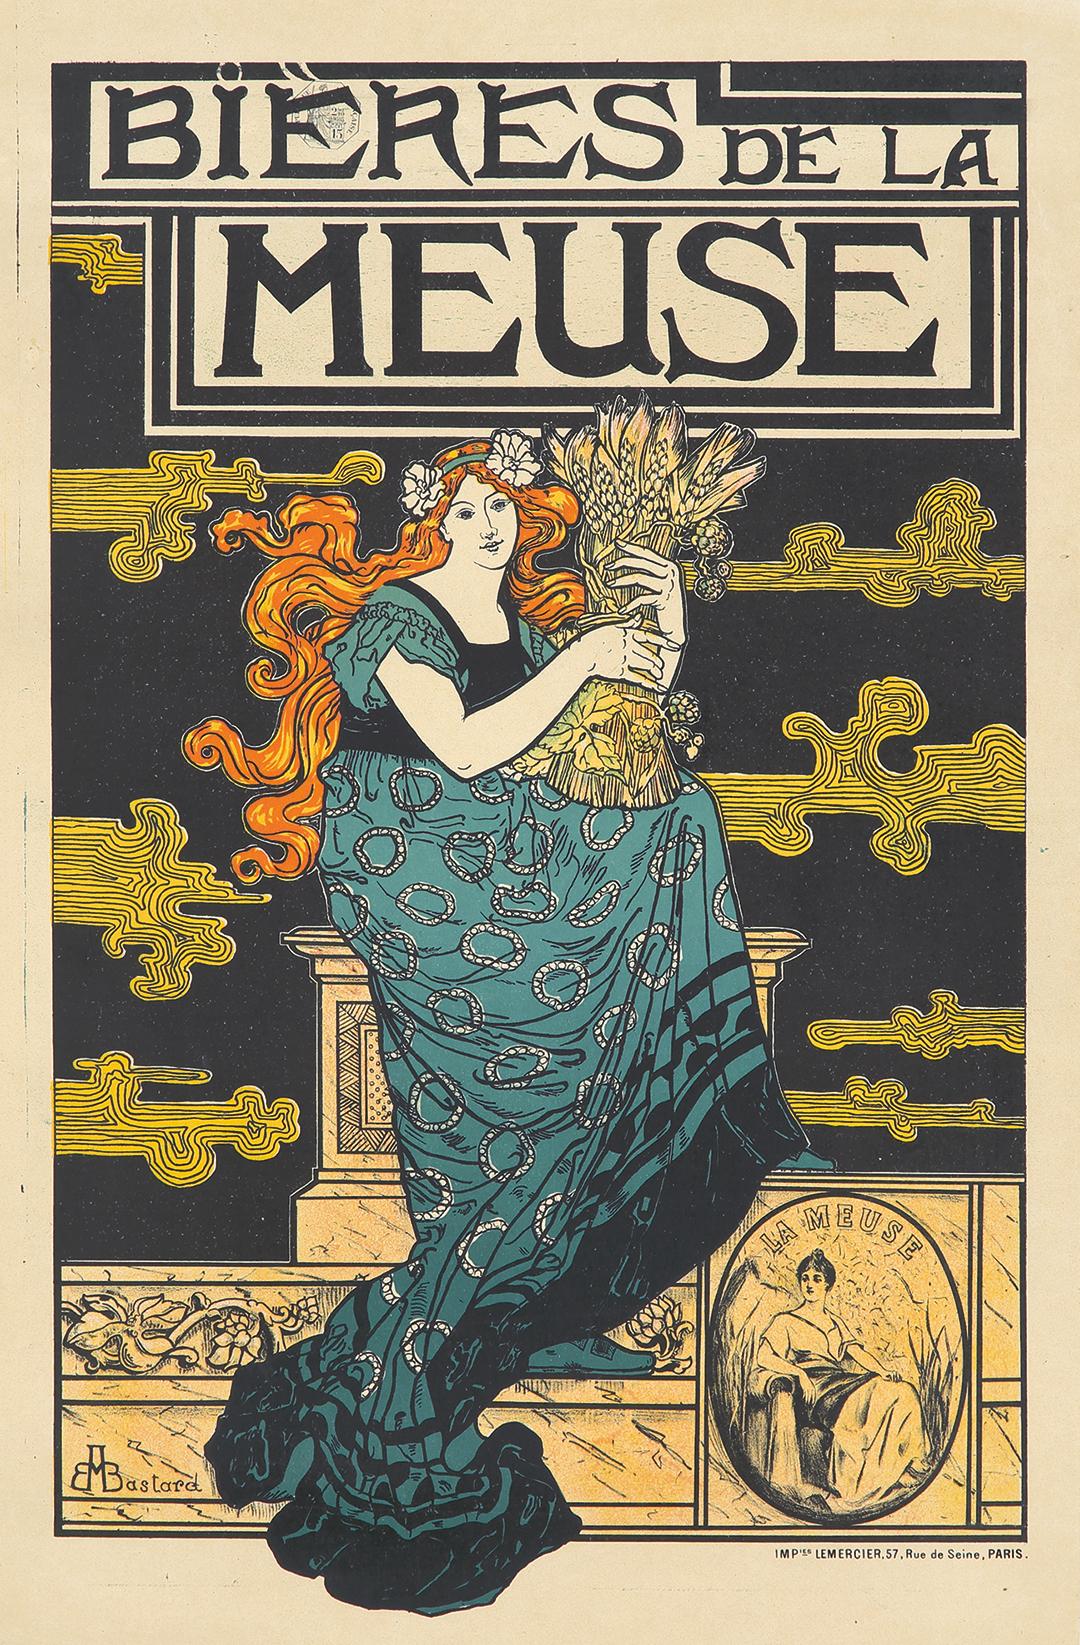 Bieres-de-la-Meuse-1896-lg